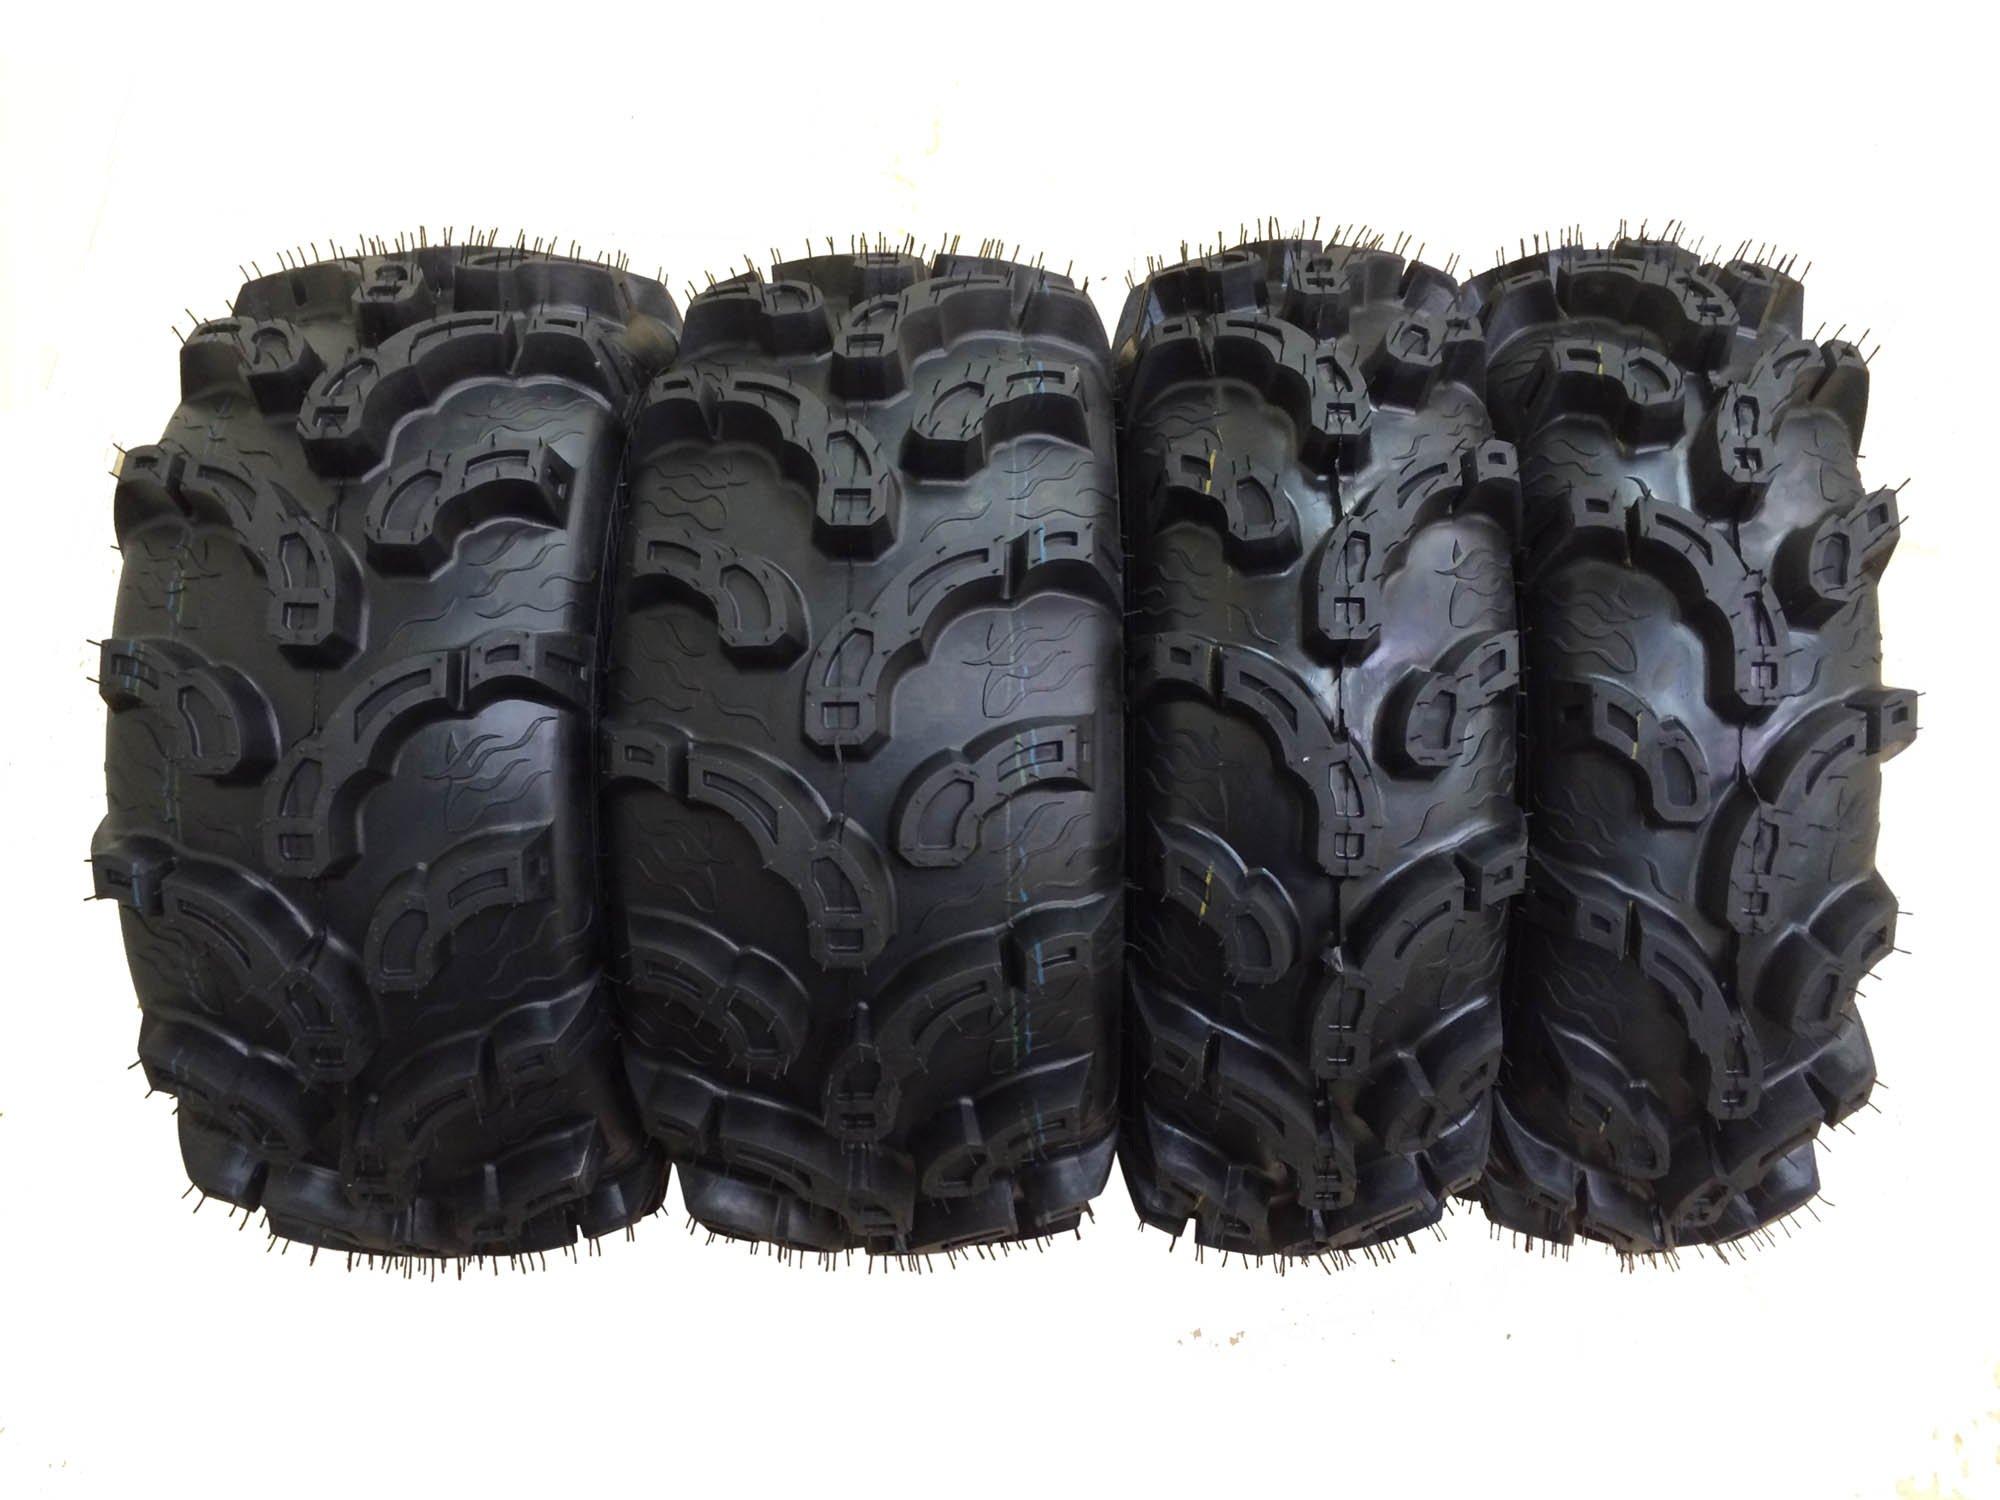 Set of 4 New Premium WANDA ATV/UTV Tires 25x8-12 Front & 25x11-10 Rear /6PR P375 10212/10216 …